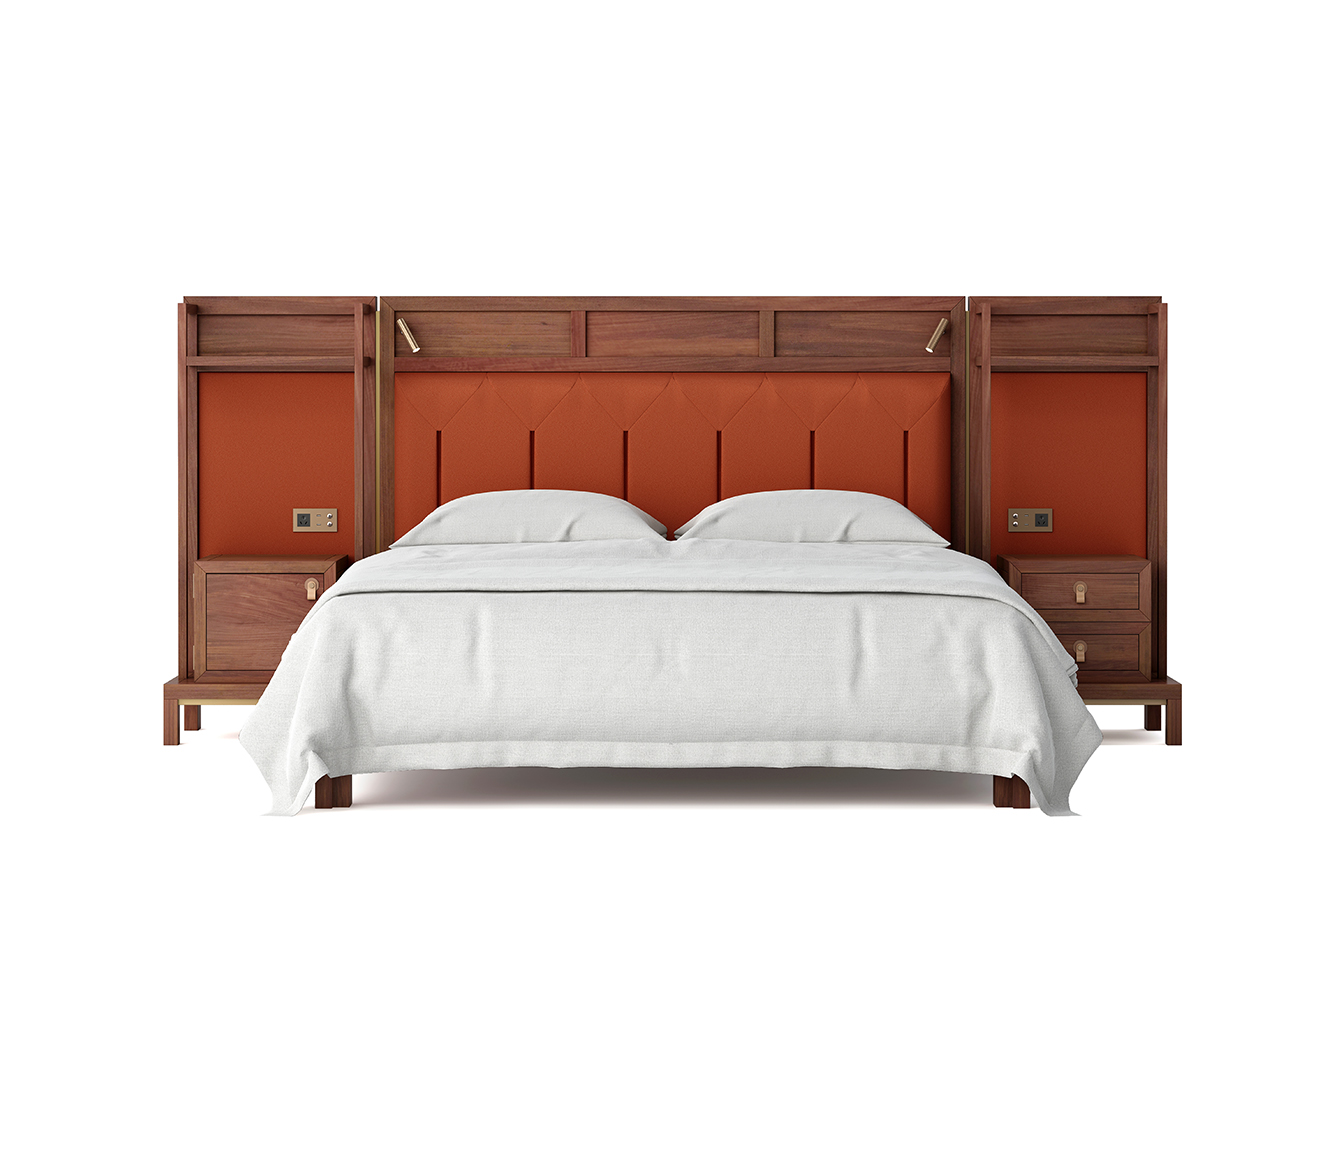 床 Bed  SC-02a / b